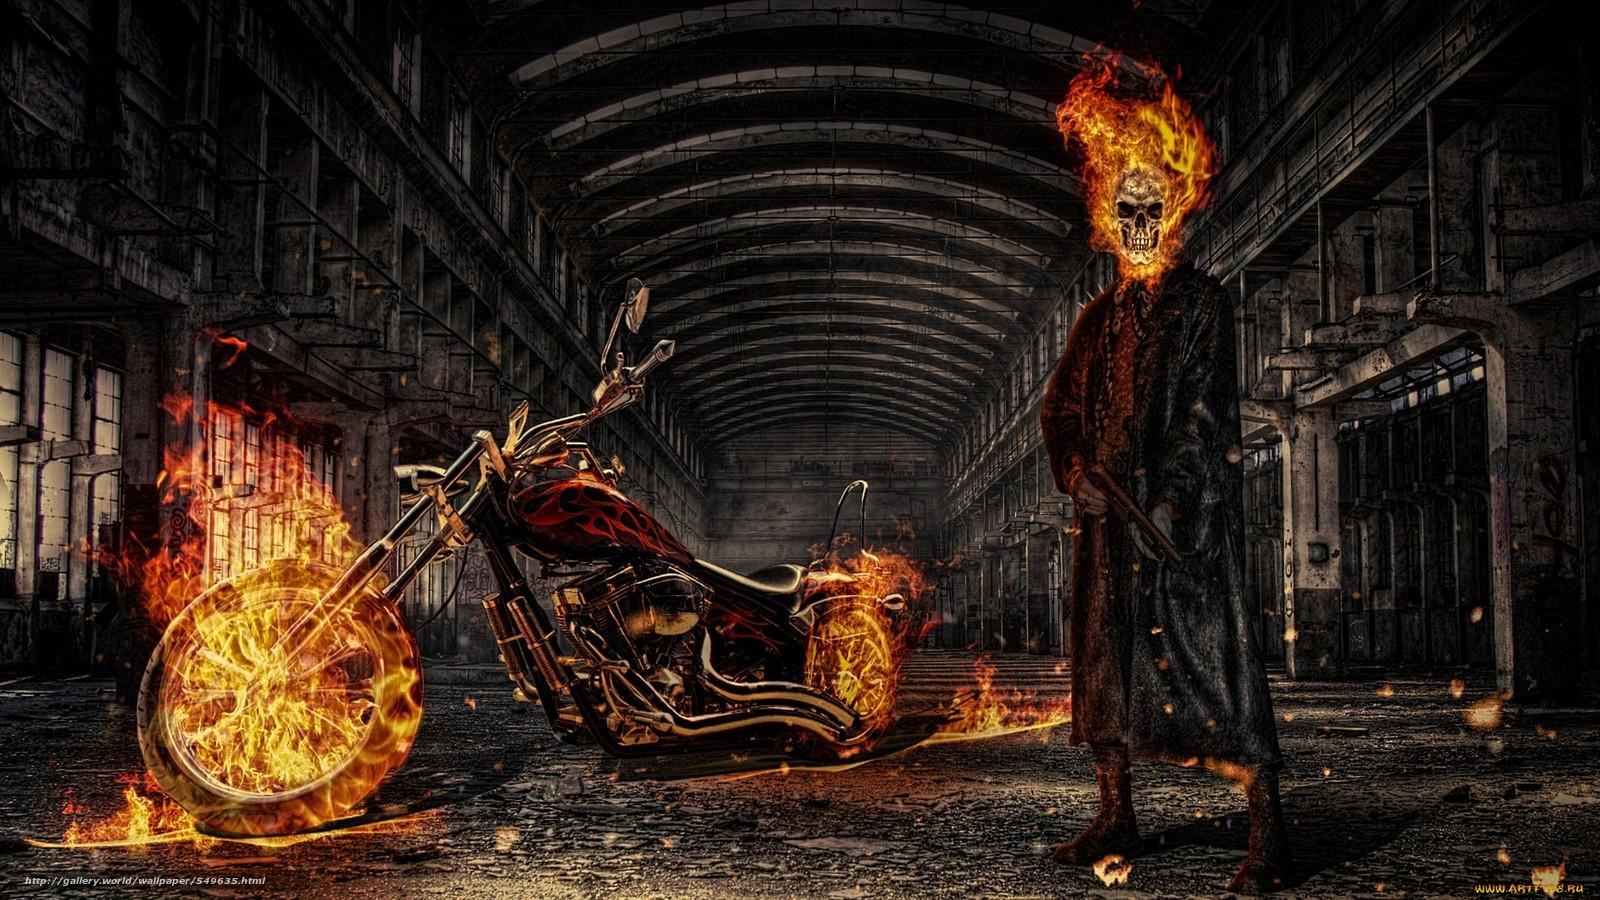 tlcharger fond d 39 ecran art ghost rider infernal fantomatique fonds d 39 ecran gratuits pour. Black Bedroom Furniture Sets. Home Design Ideas